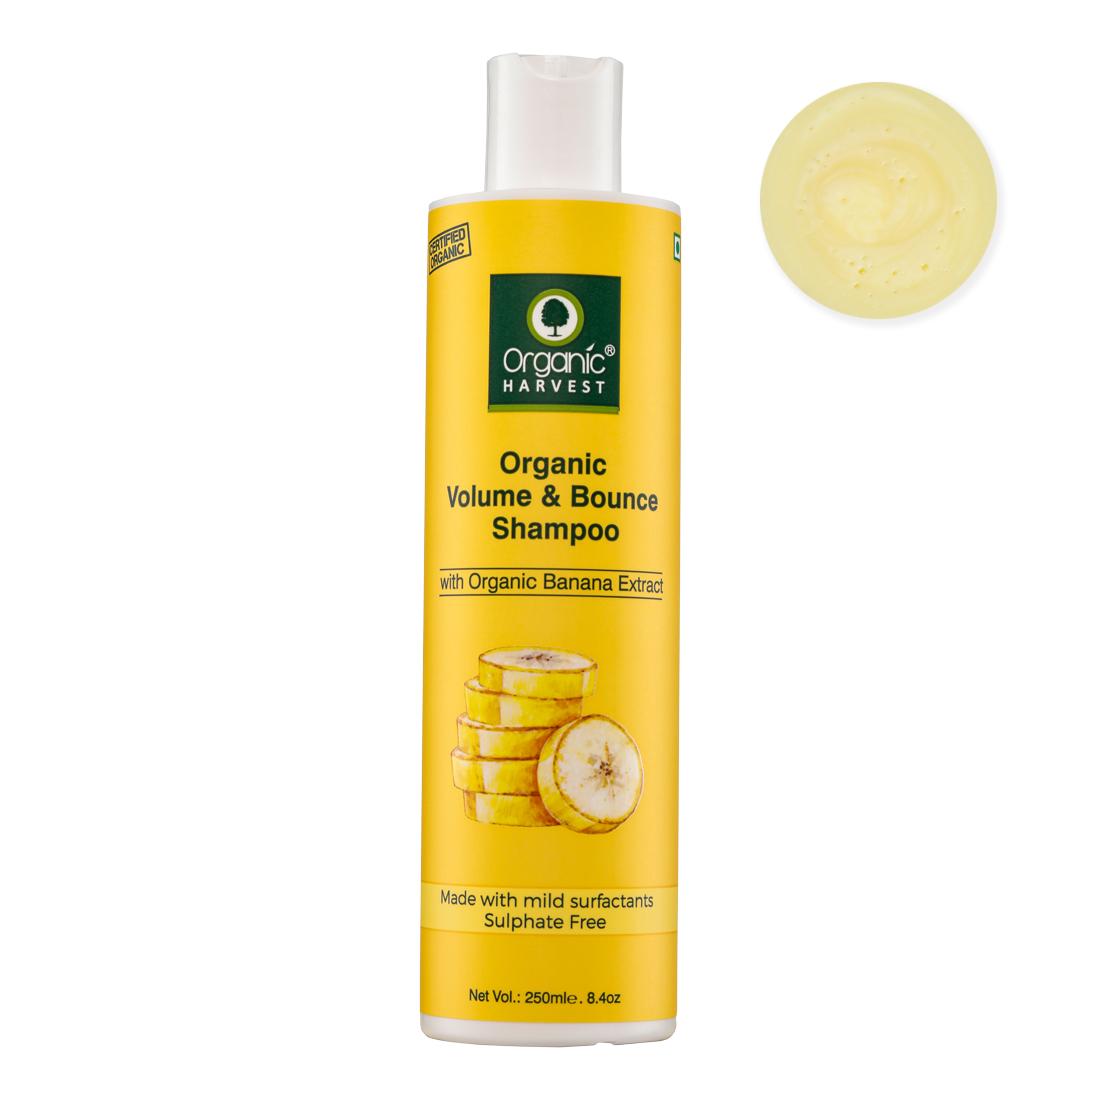 Organic Harvest | Organic Harvest's Pure Banana Extract Volumizing Shampoo, Free From Parabens & Sulphates, Suitable Volume Shampoo for Thin Hair, 250 ml